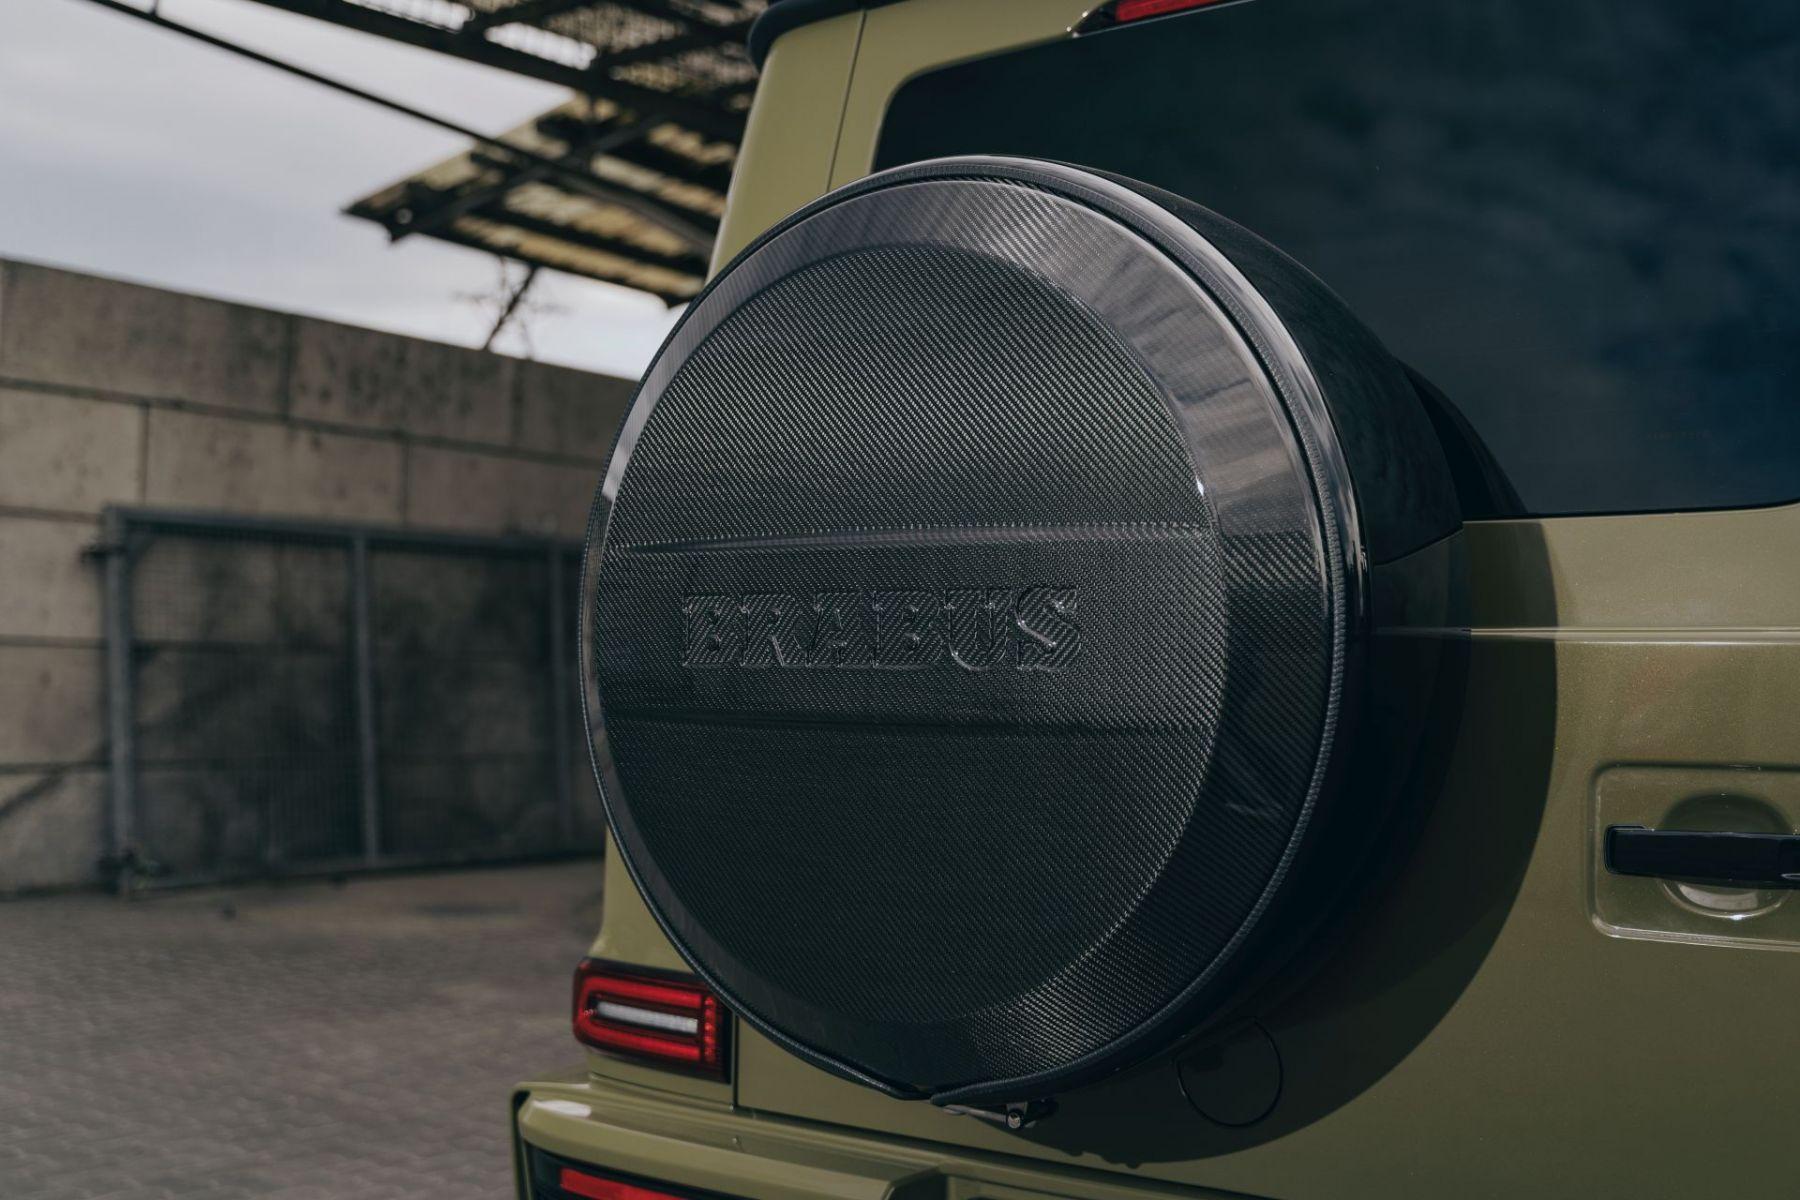 Mercedes-AMG G63 Brabus Fostla